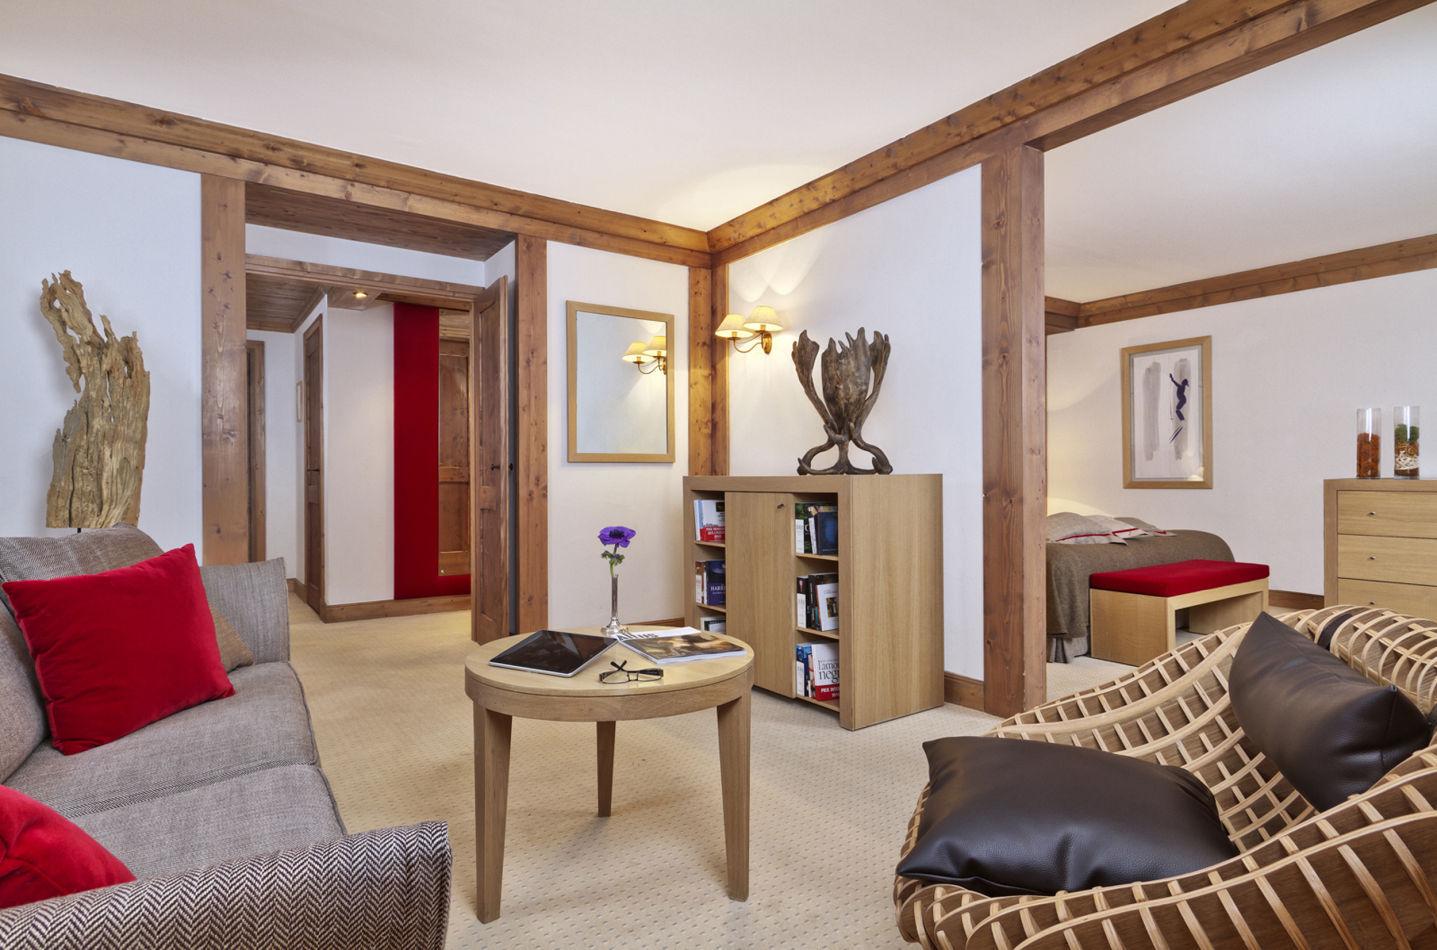 17-suite-prestige-tendence-loft-prestige-suite-trendy-loft